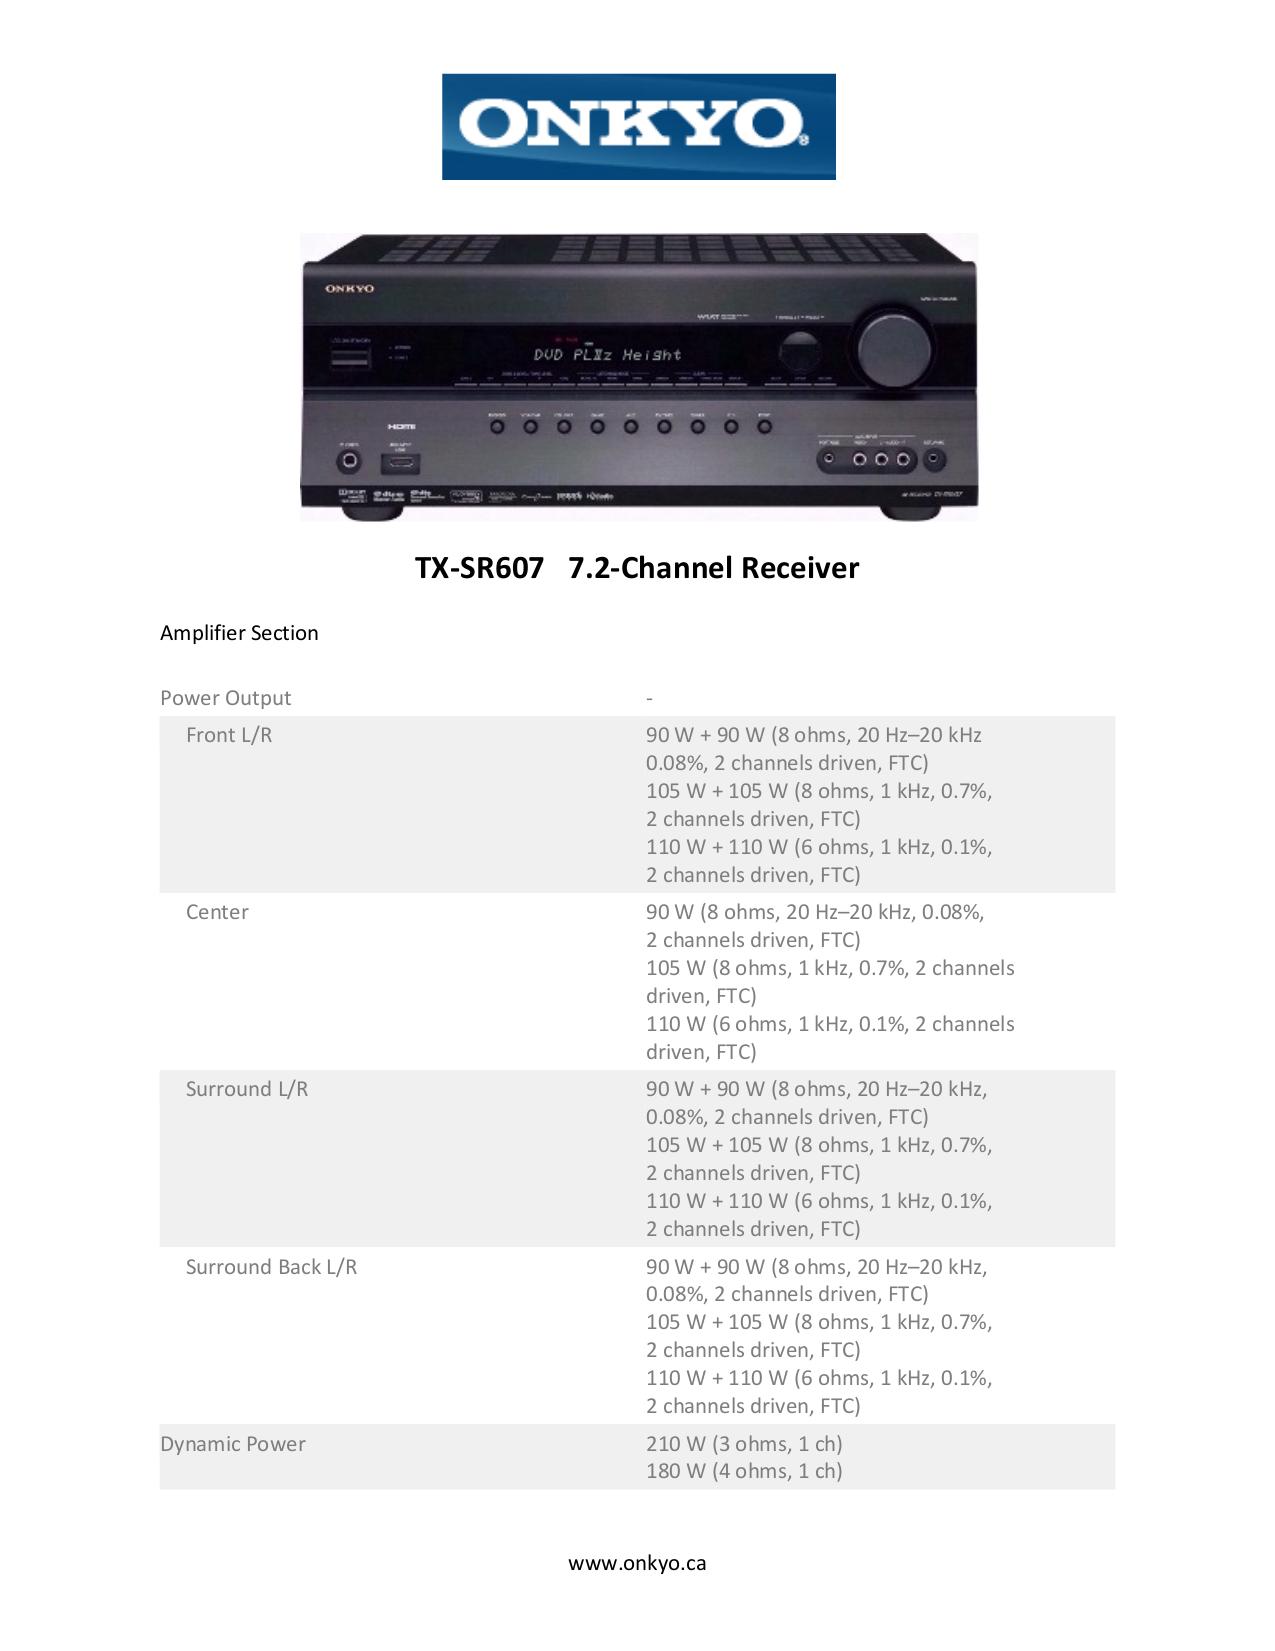 download free pdf for onkyo tx sr607 receiver manual rh umlib com onkyo tx-sr607 service manual pdf onkyo tx-sr607 service manual pdf